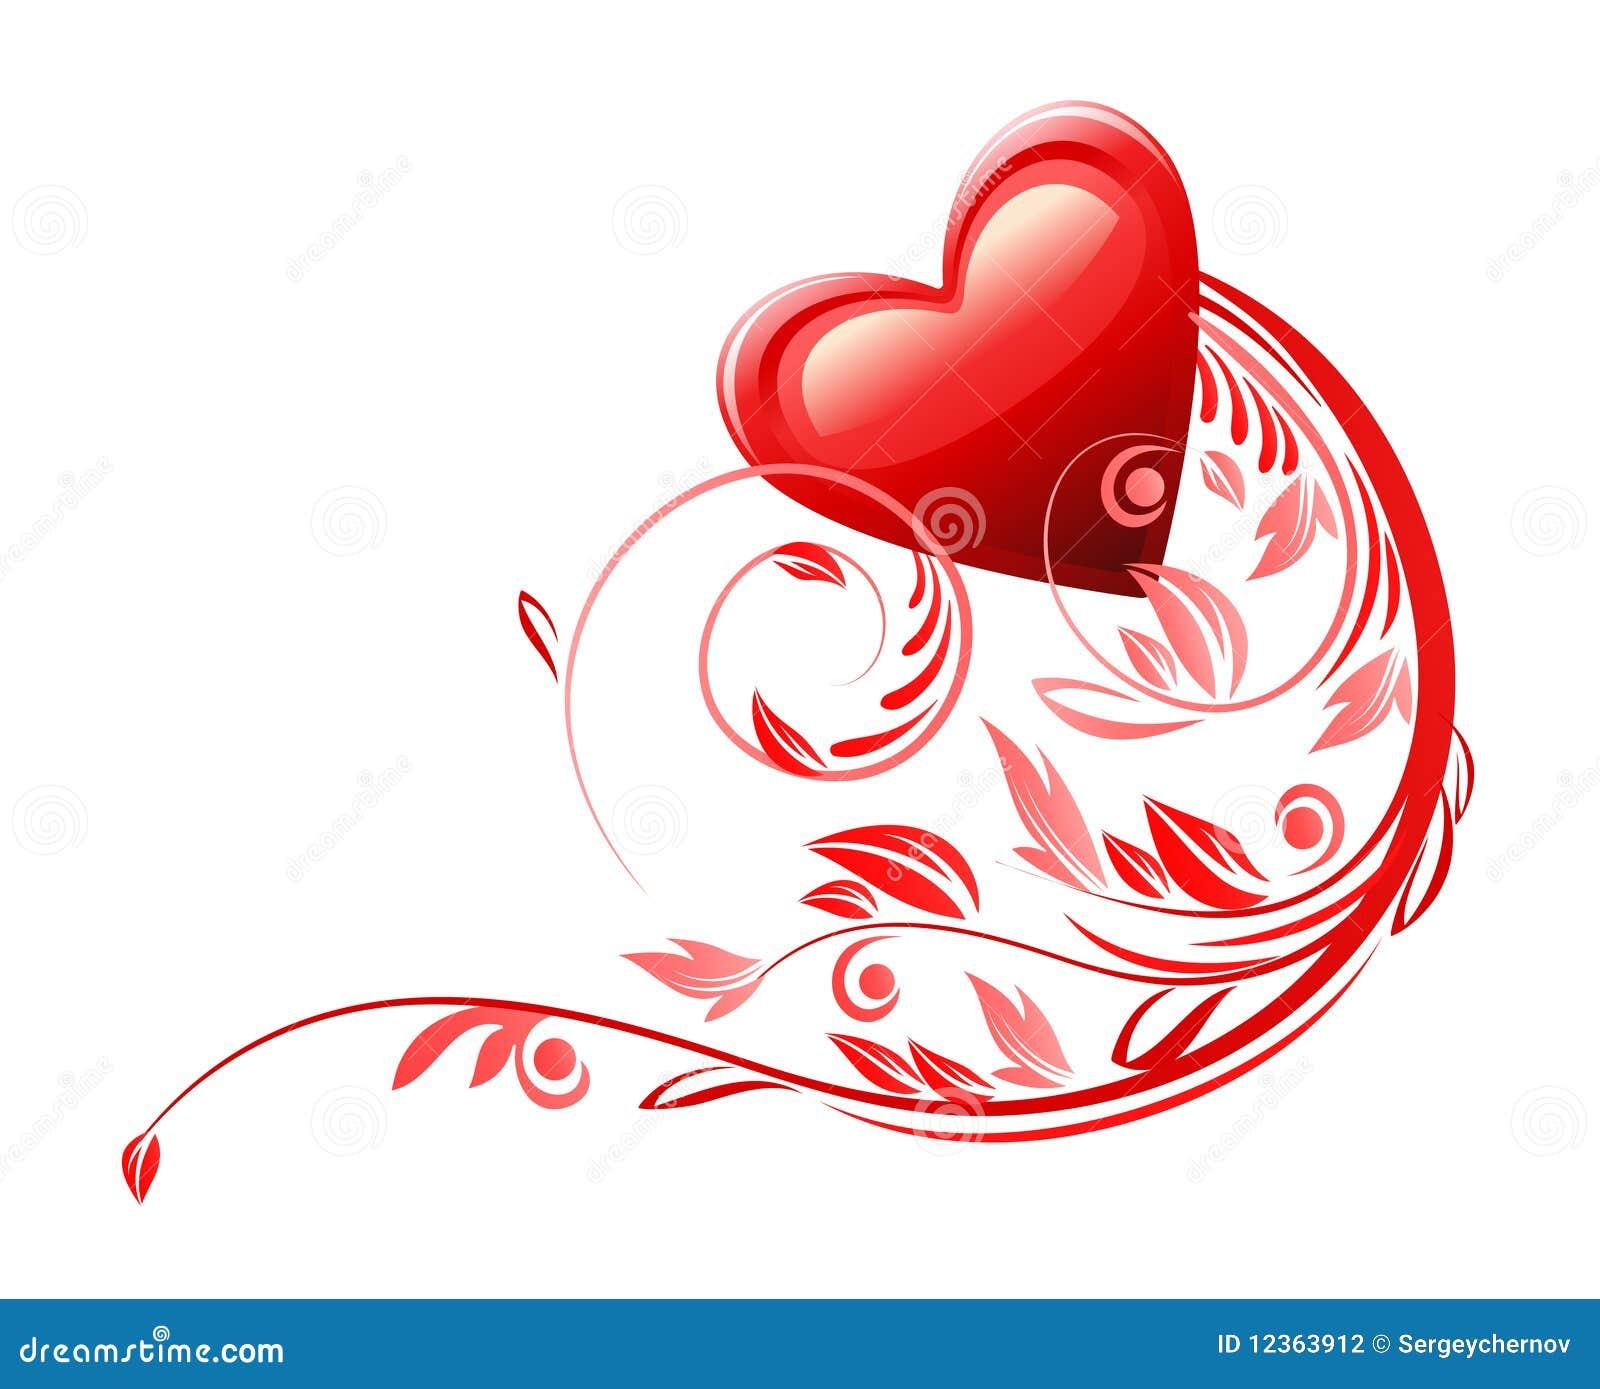 Love heart symbol stock illustration illustration of flourish love heart symbol flourish icon buycottarizona Images